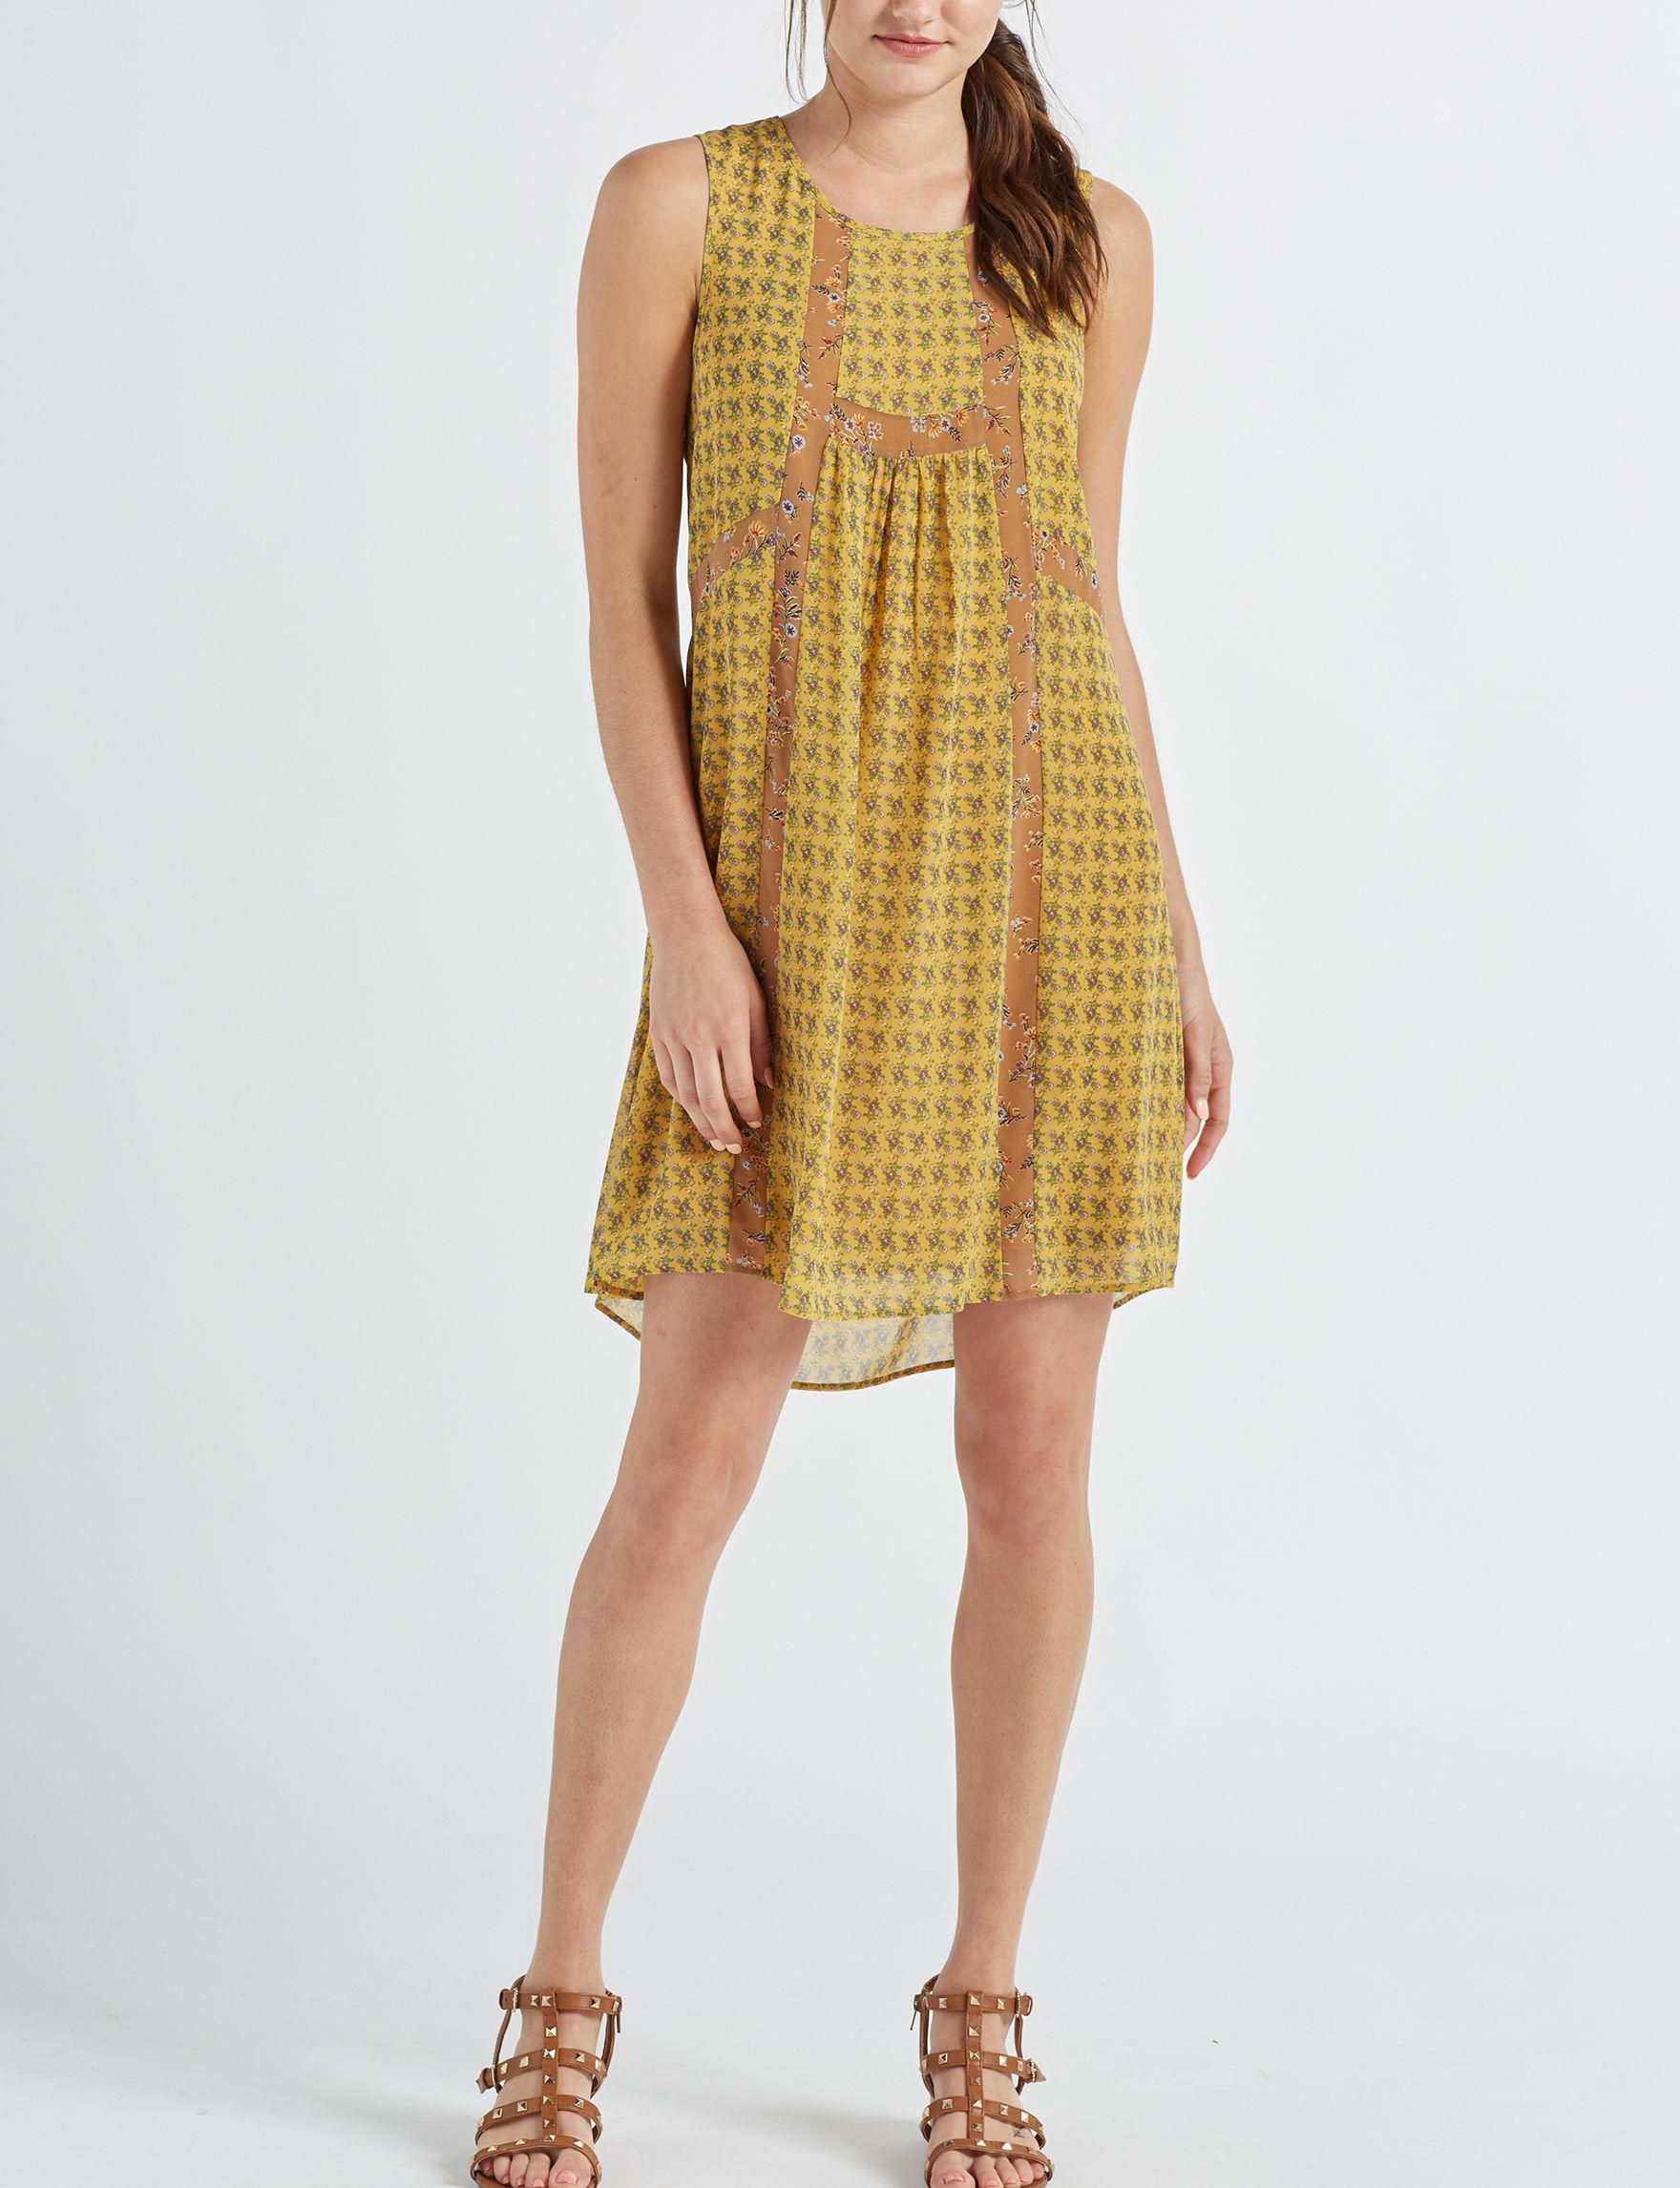 Signature Studio Mustard Everyday & Casual Shift Dresses